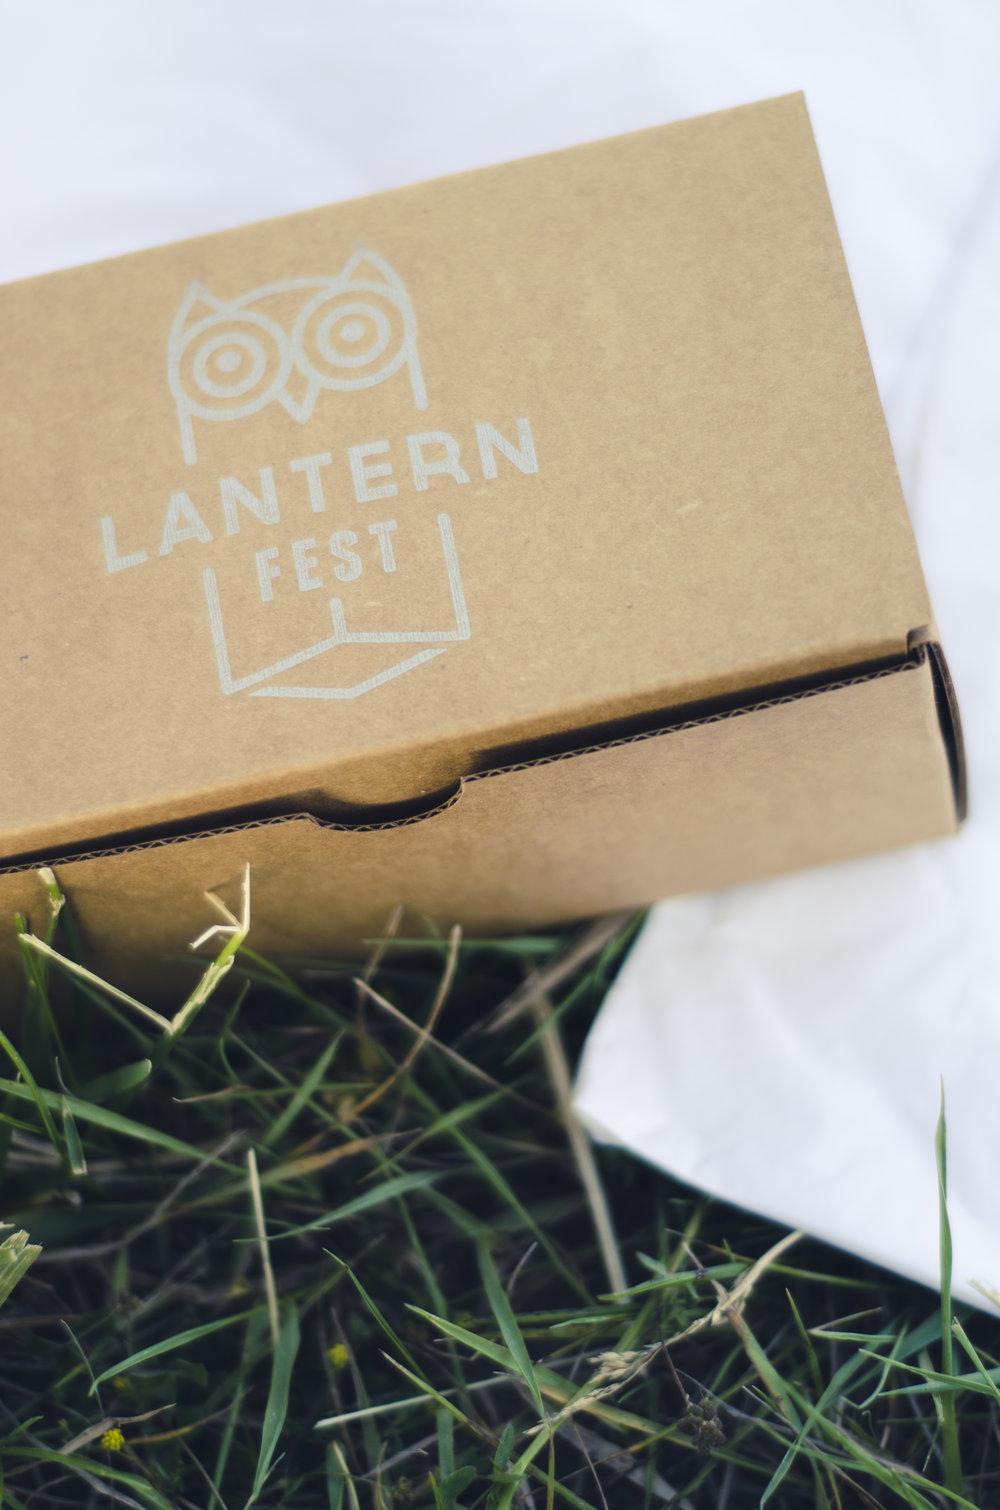 Indy Lantern Fest_7.jpg